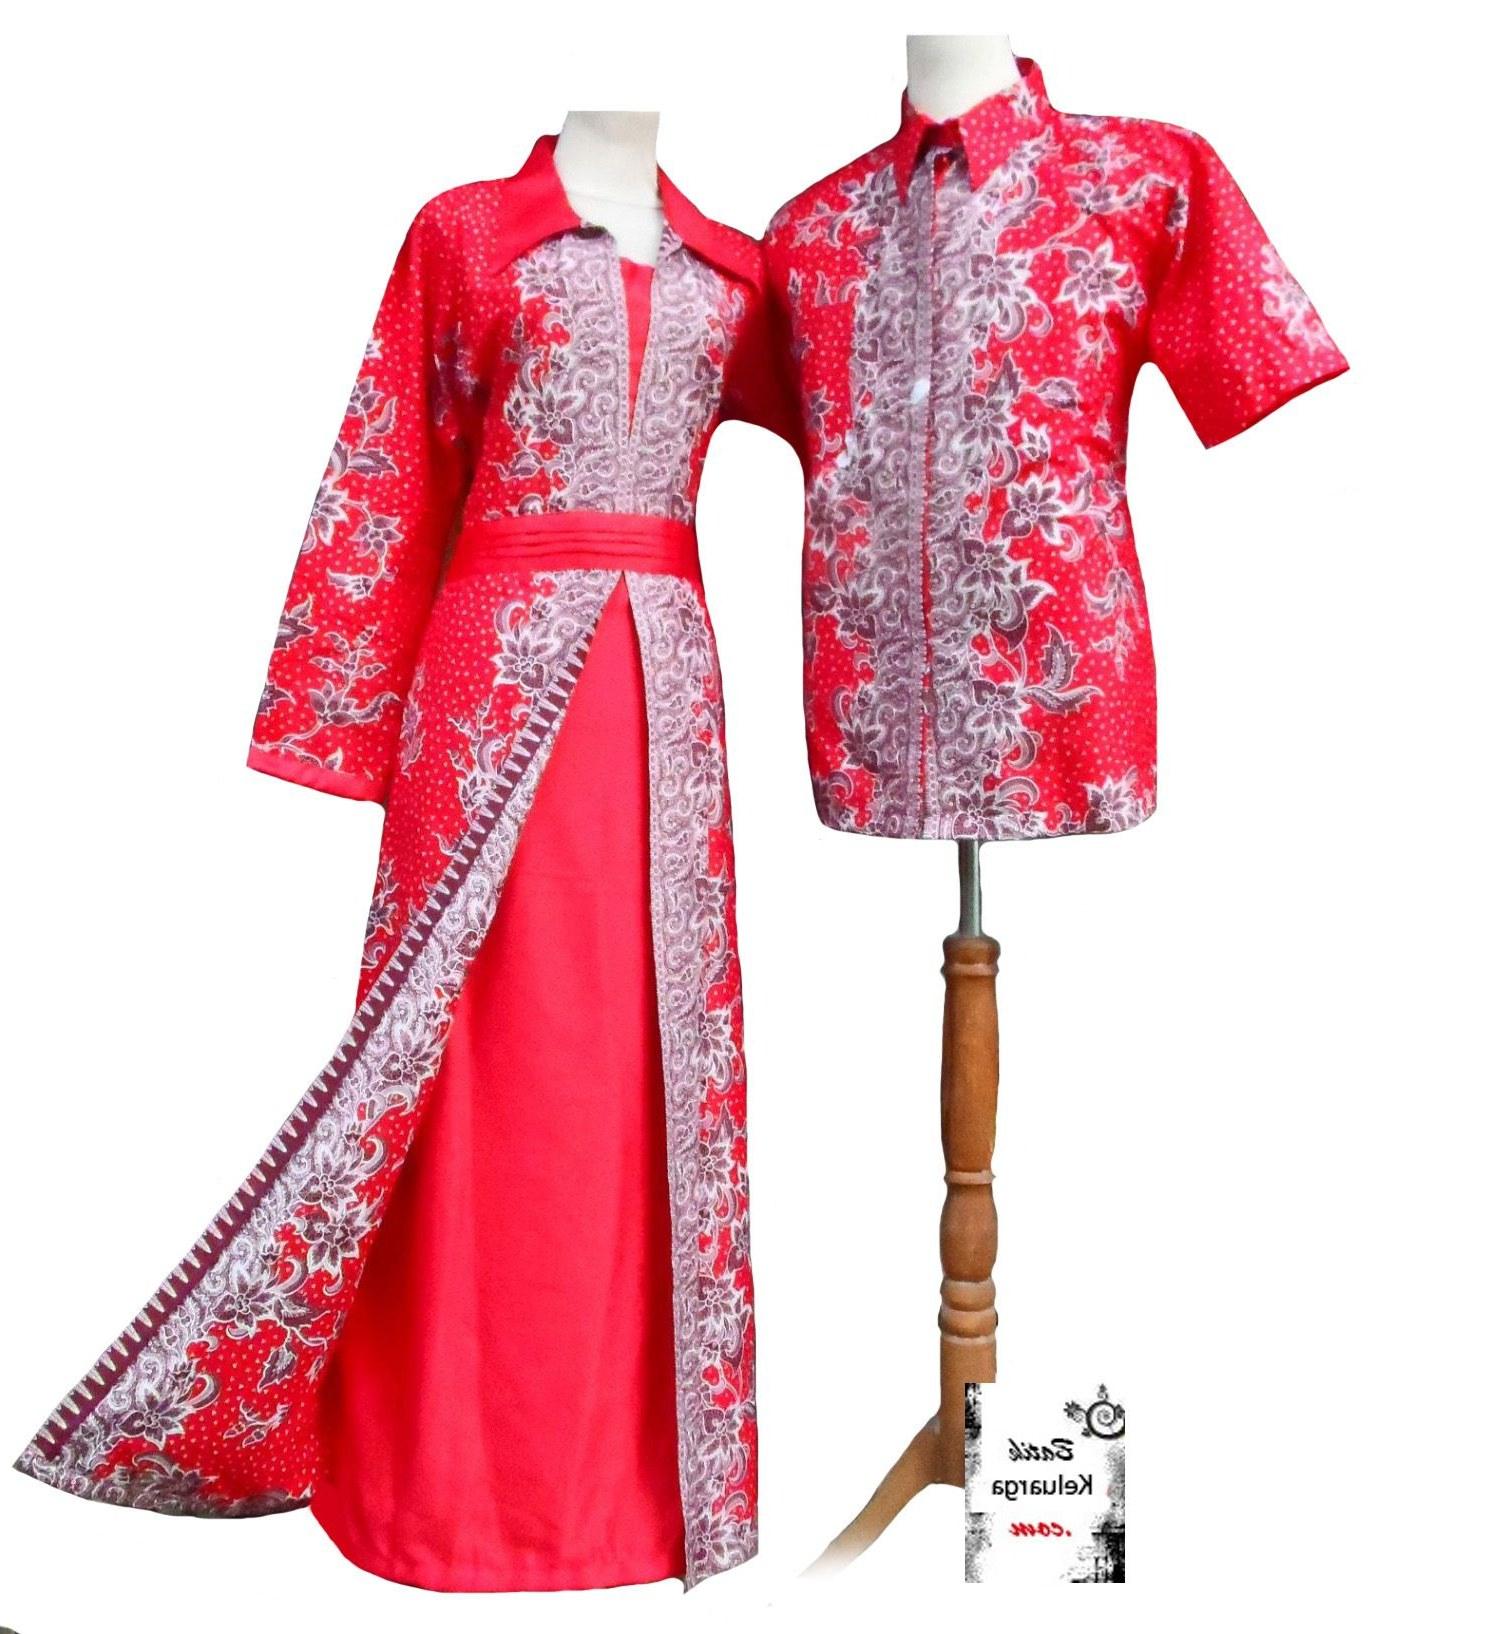 Bentuk Design Baju Lebaran Etdg Baju Lebaran 2016 Batik Keluarga Pinterest Models